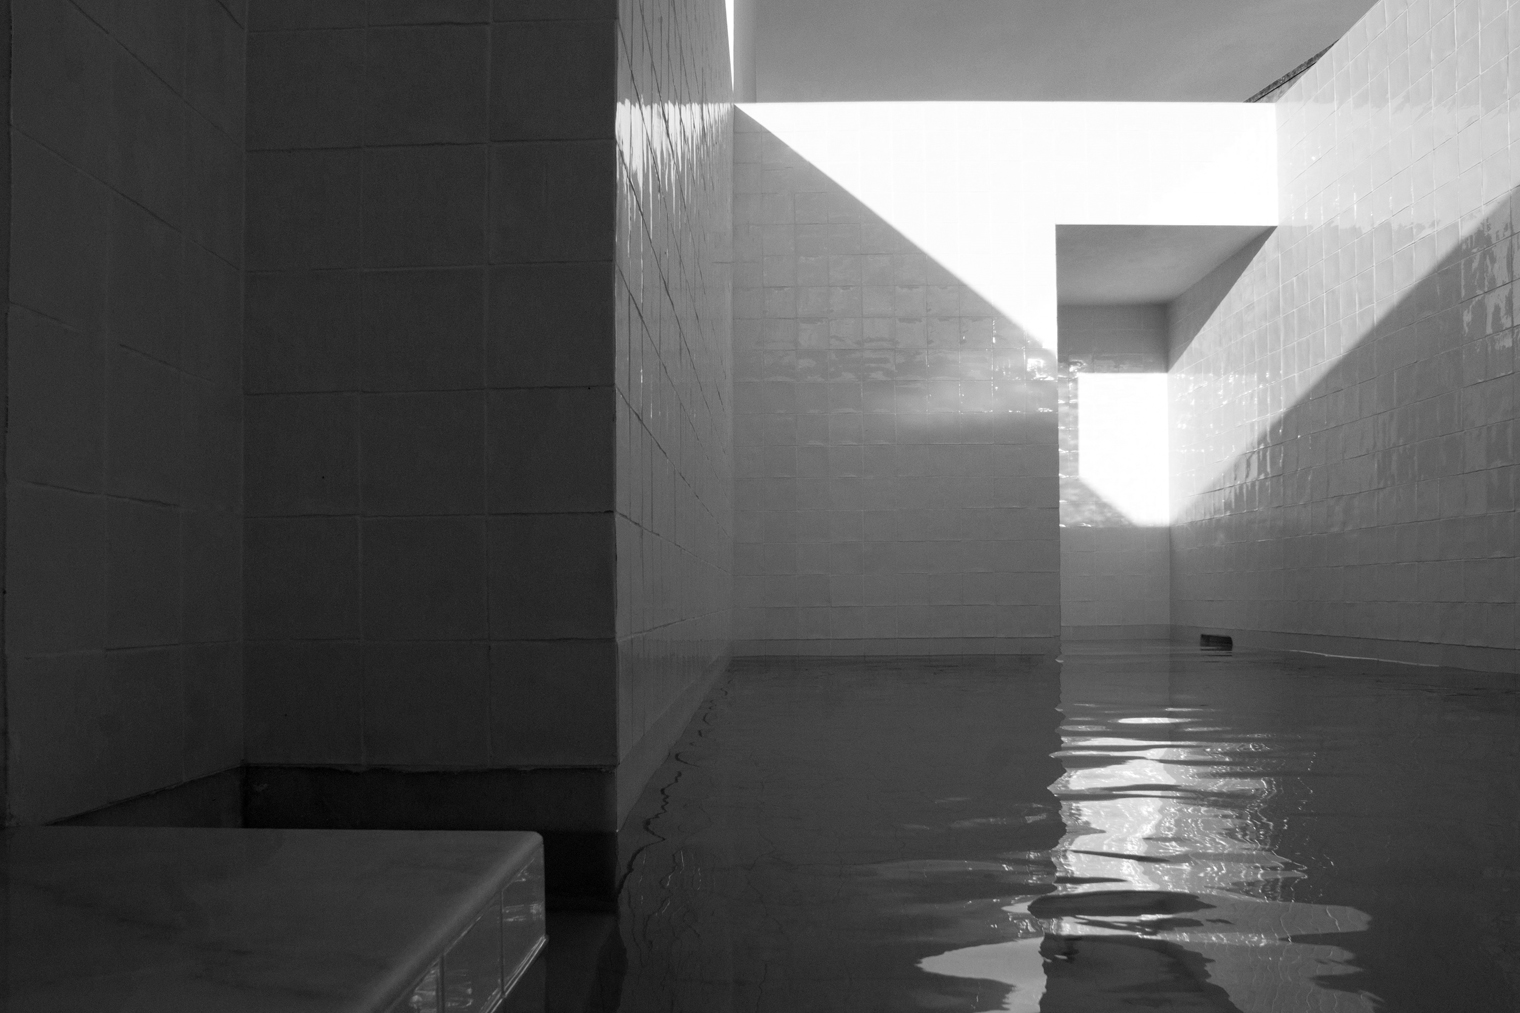 piscina Casa em Alfama lisboa Matos Gameiro arquitectos diariodesign